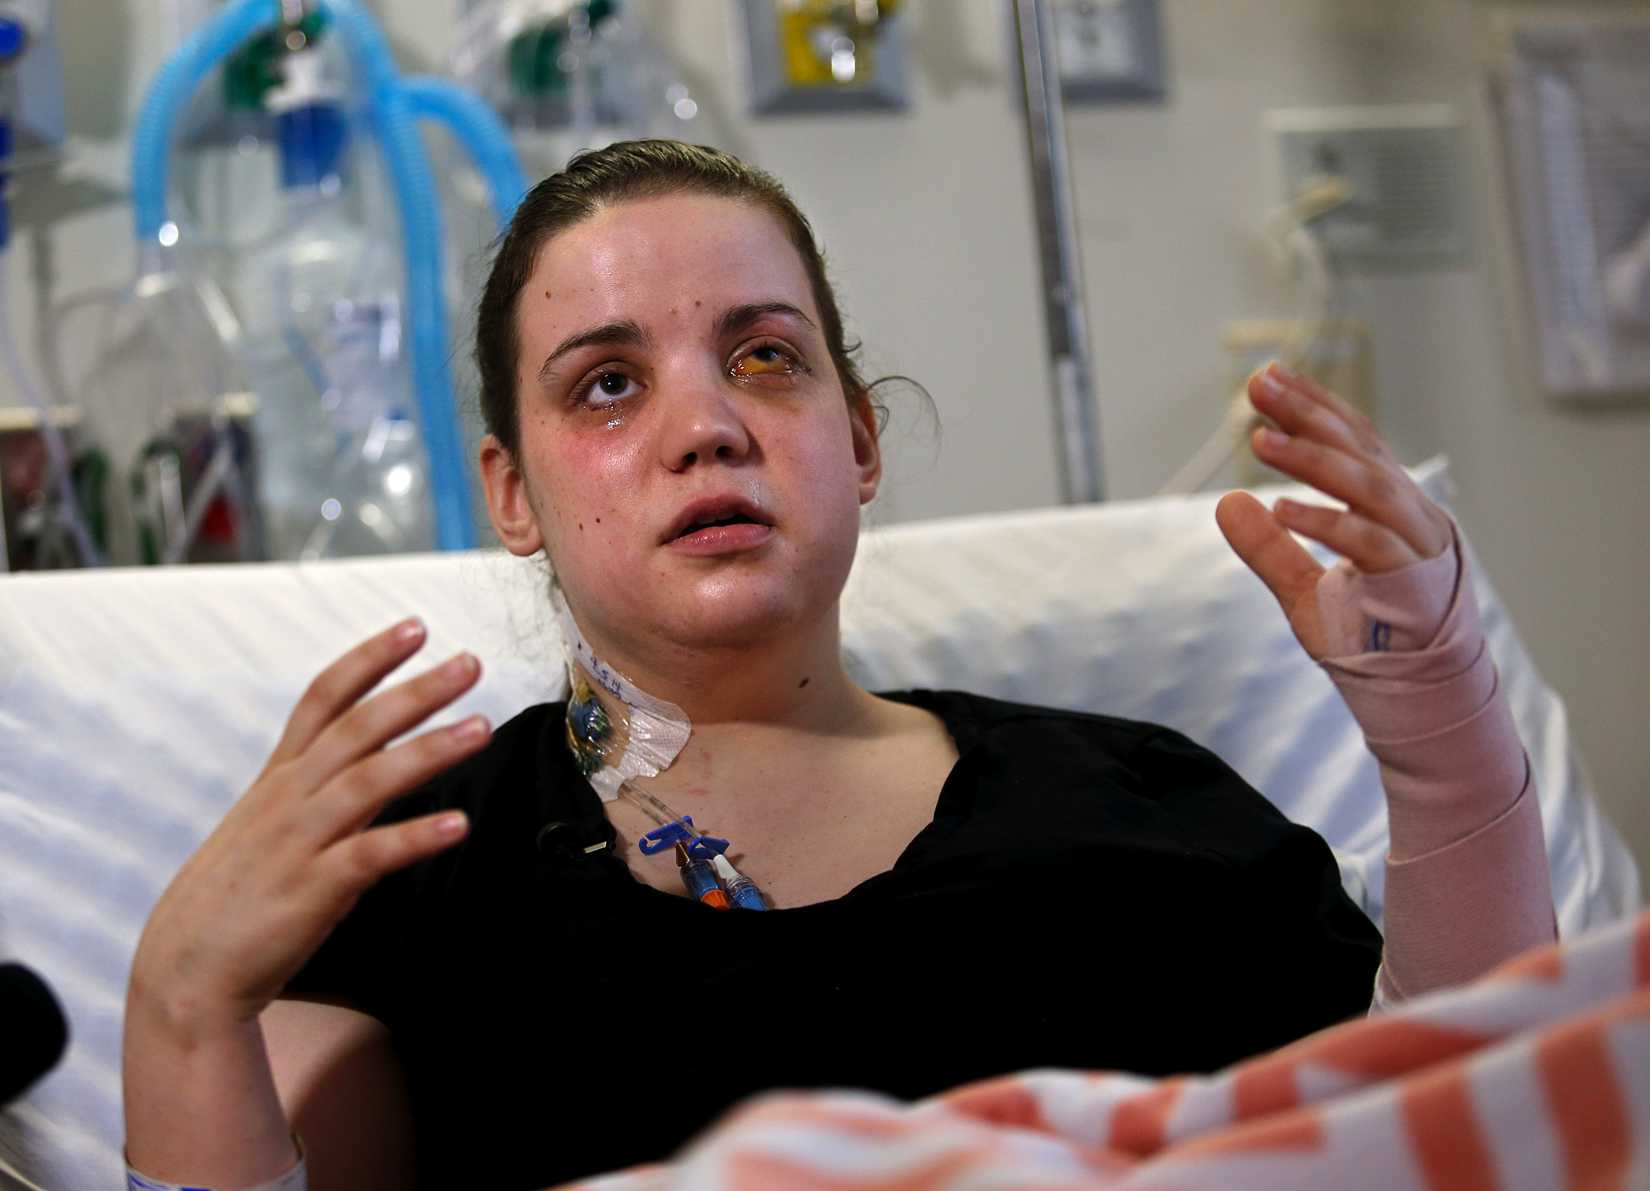 Washington mudslide survivor Amanda Skorjanc, 25, talks to the media while sitting in her hospital bed on Wednesday, April 9, 2014, in Seattle.